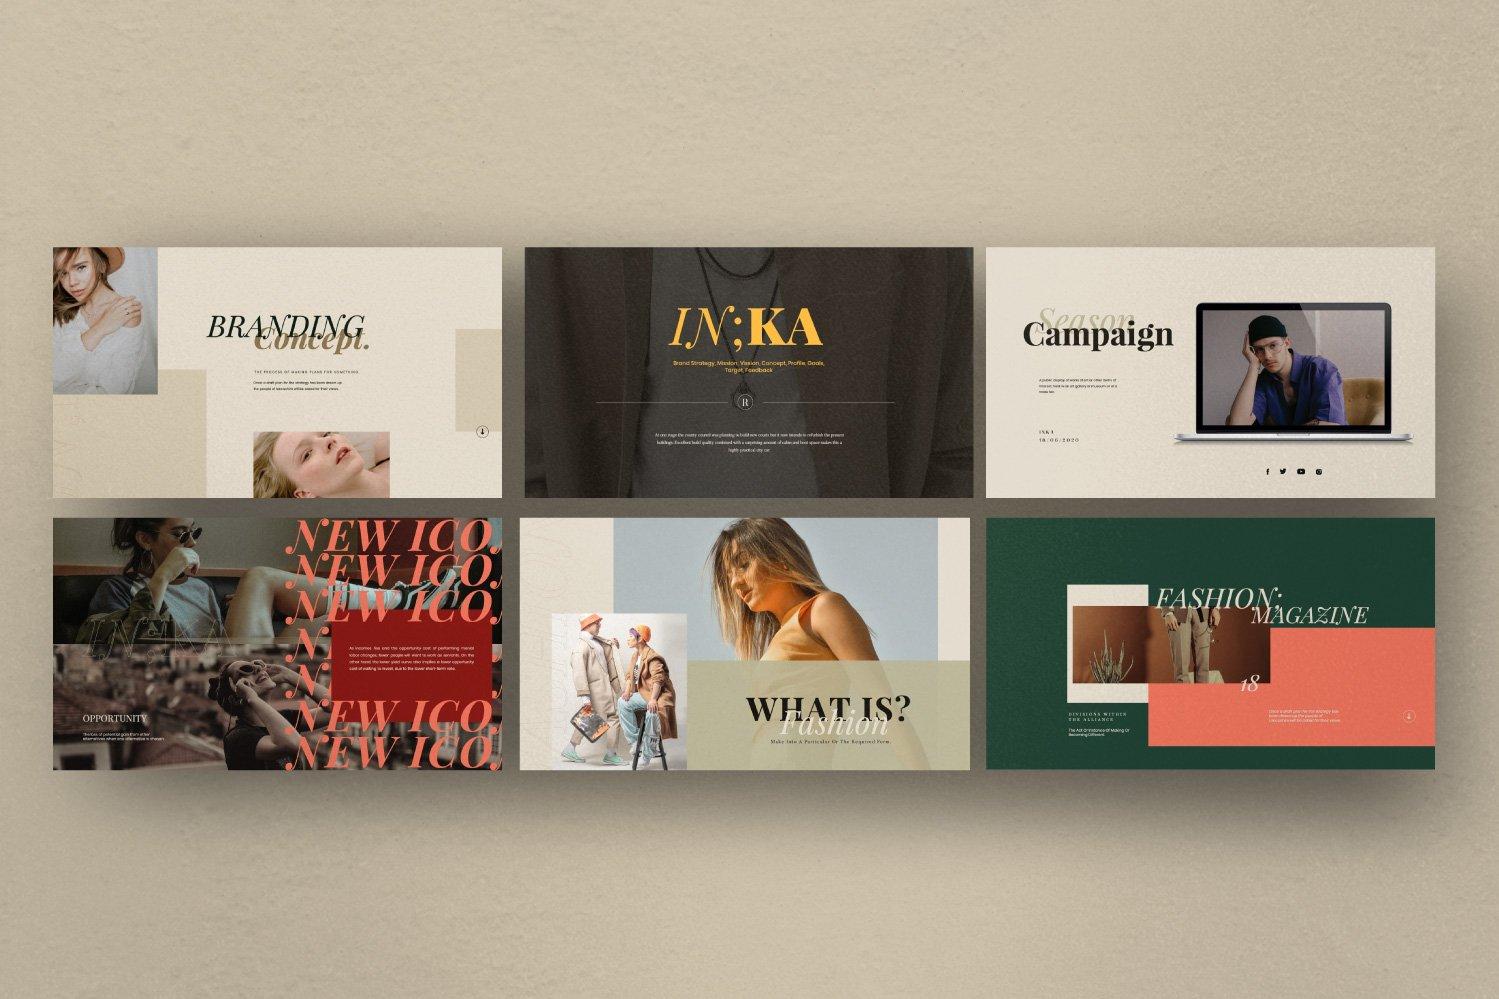 时尚创意服装摄影作品集幻灯片设计模板 Iconic – Fashion Lookbook PowerPoint插图(6)